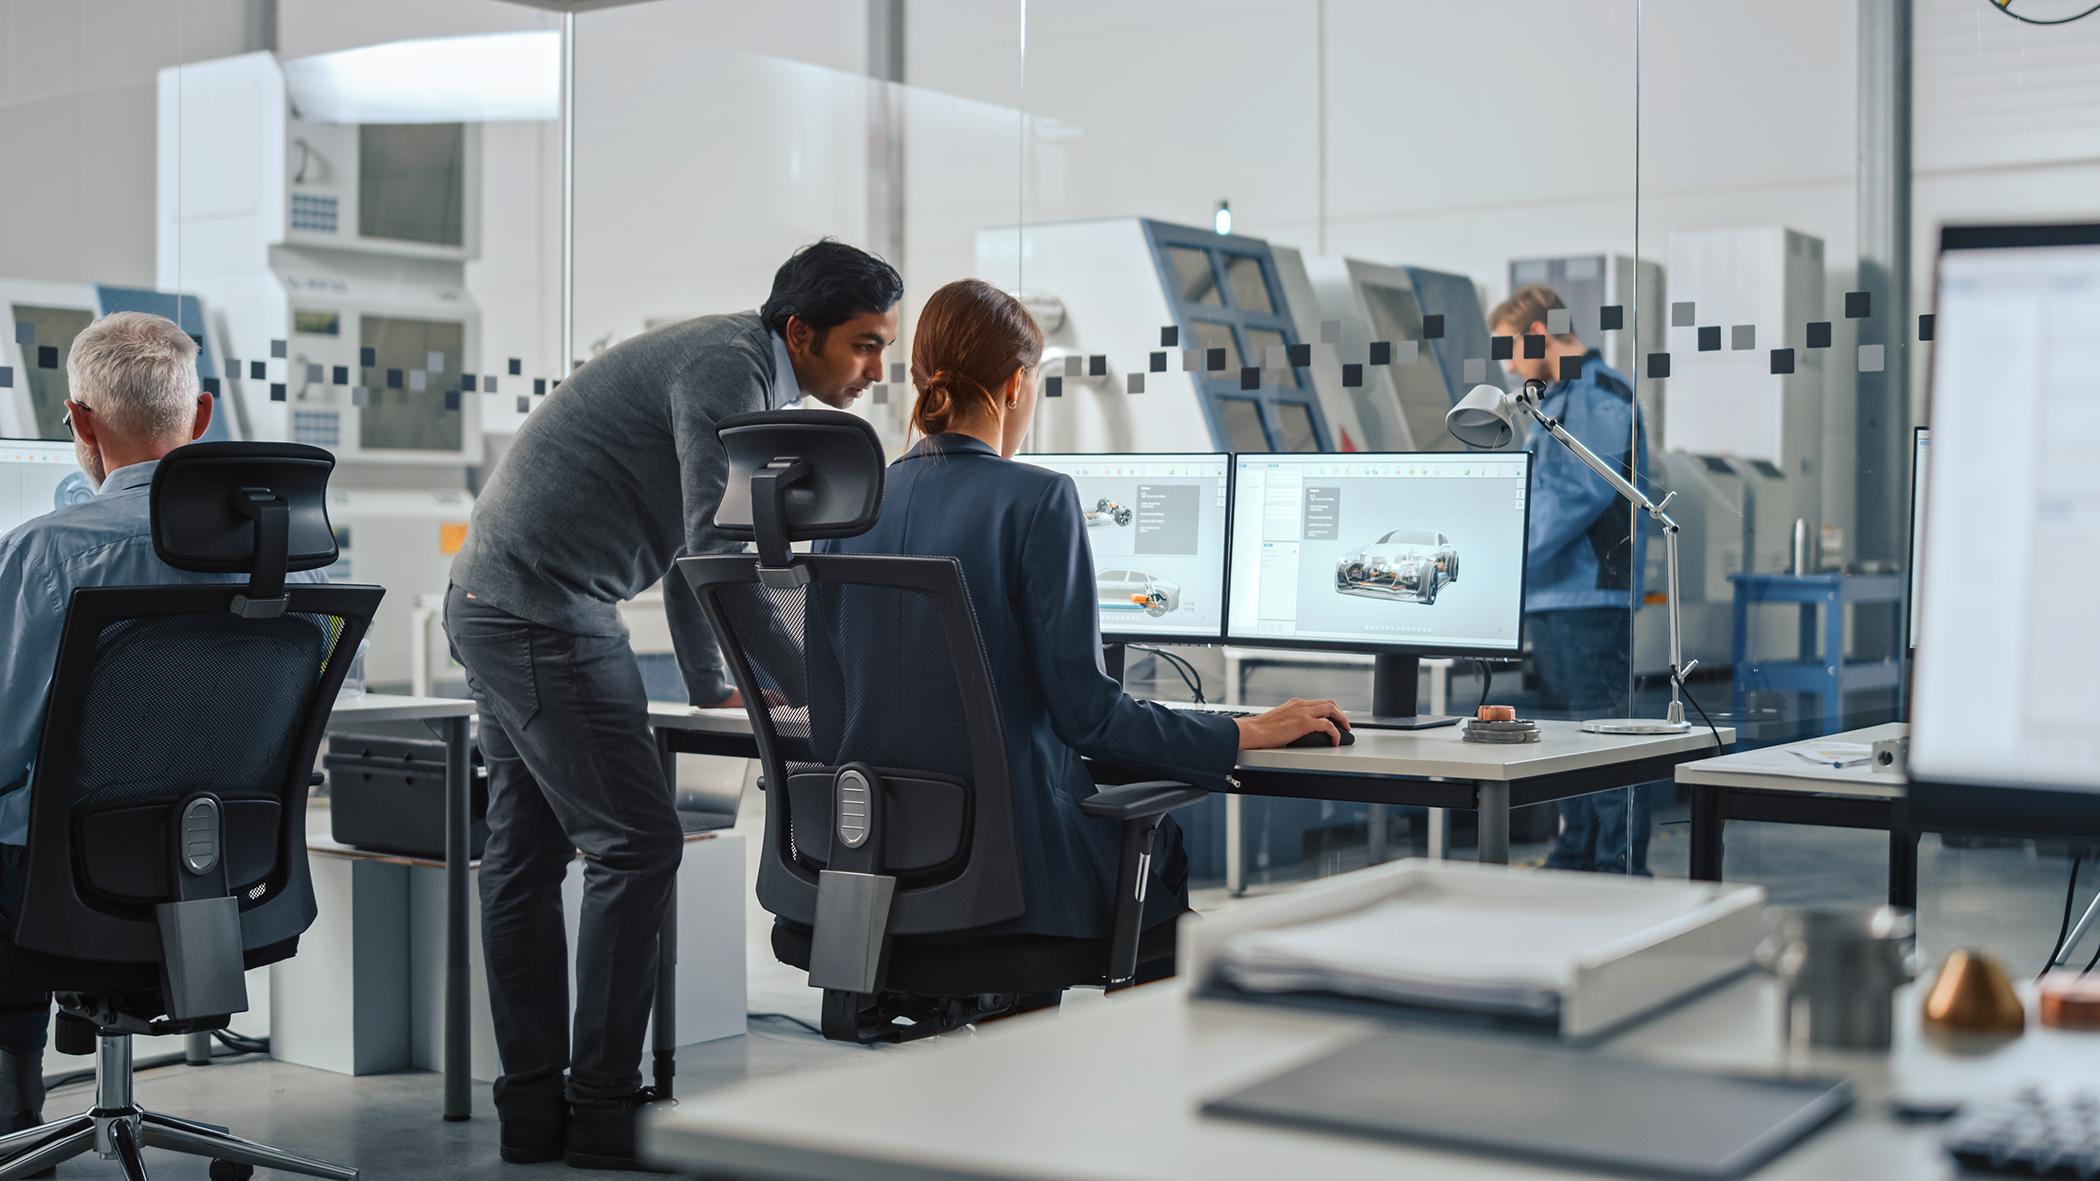 Wandel der Fahrzeugelektronik aktiv gestalten